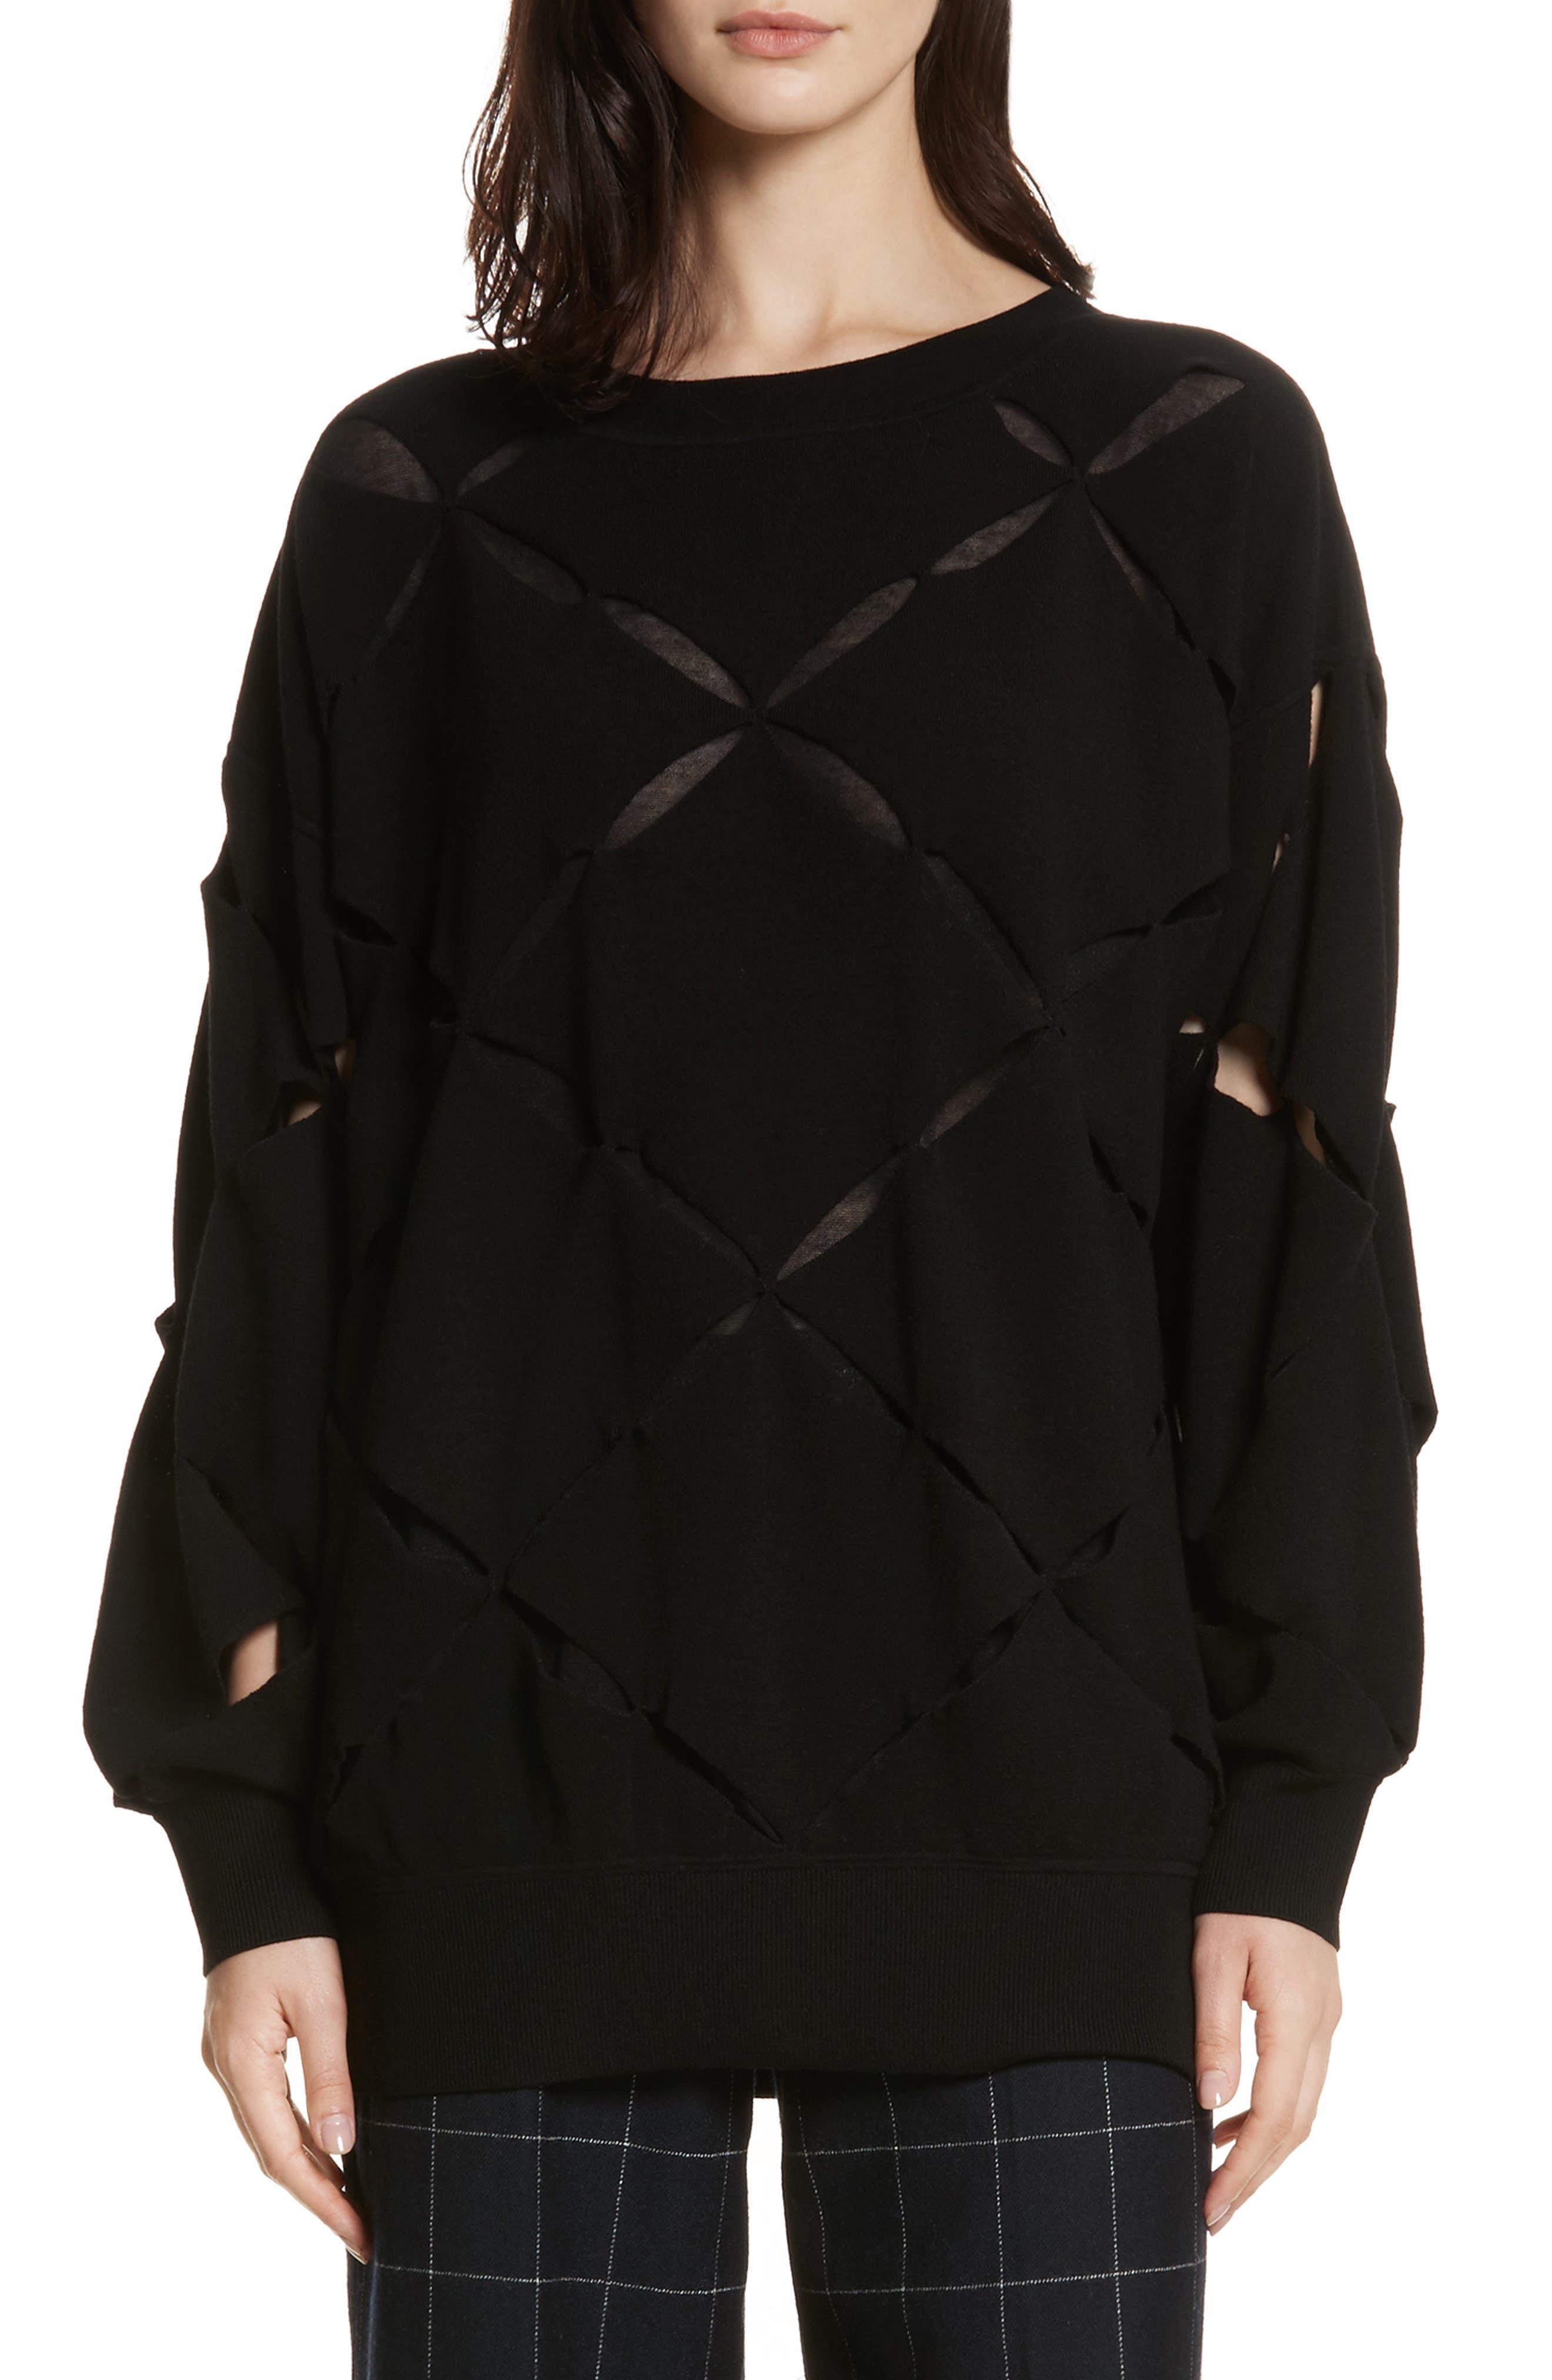 Roz Cutout Sweater,                             Main thumbnail 1, color,                             Black